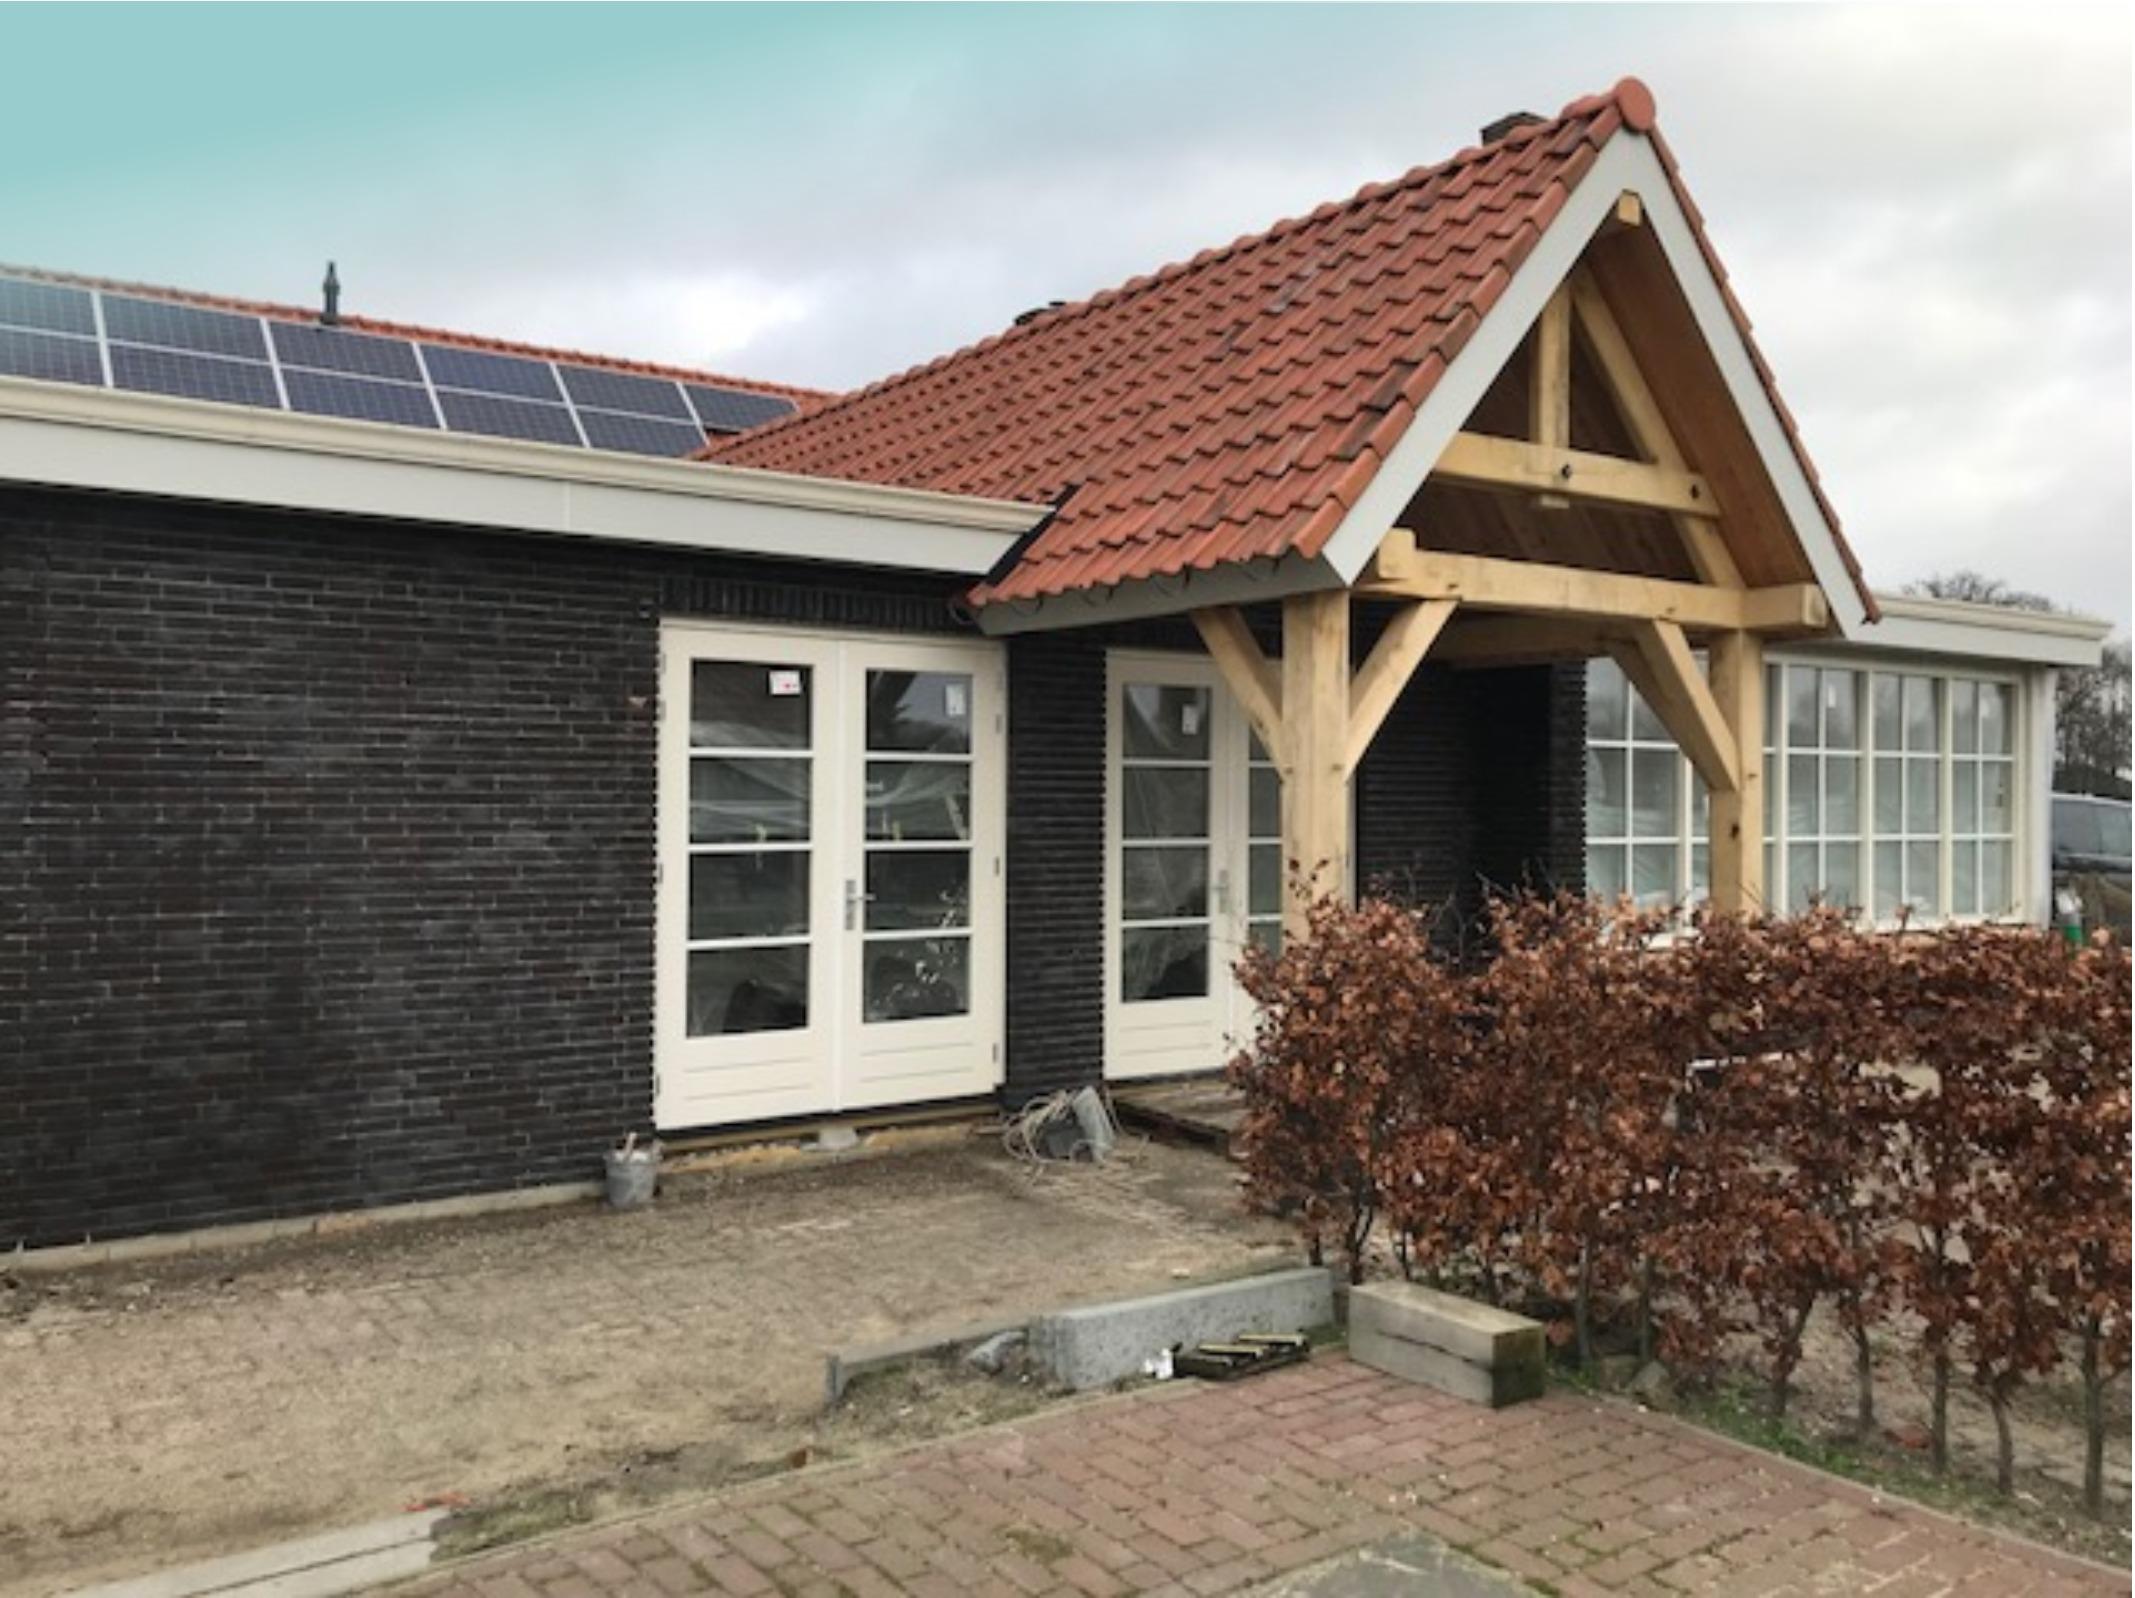 Uitbreiding woonhuis Zeeland. Gereed begin 2018